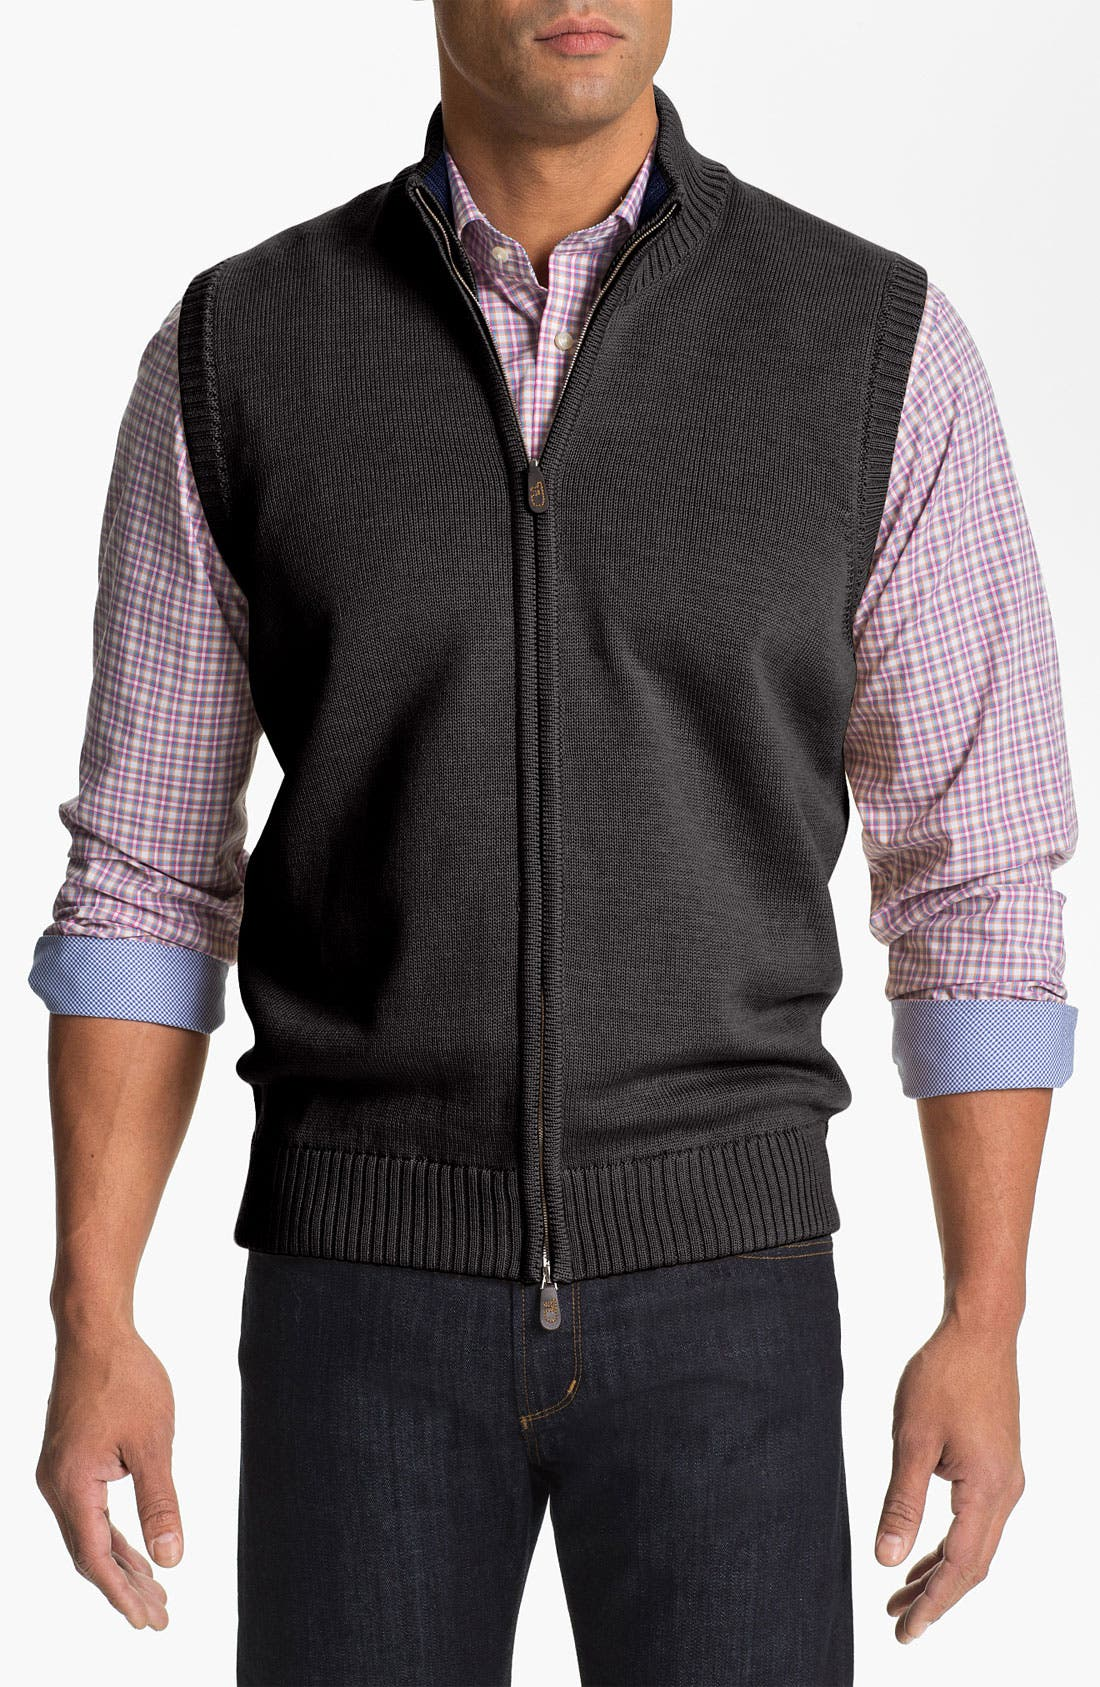 Alternate Image 1 Selected - Thomas Dean Zip Front Wool Sweater Vest